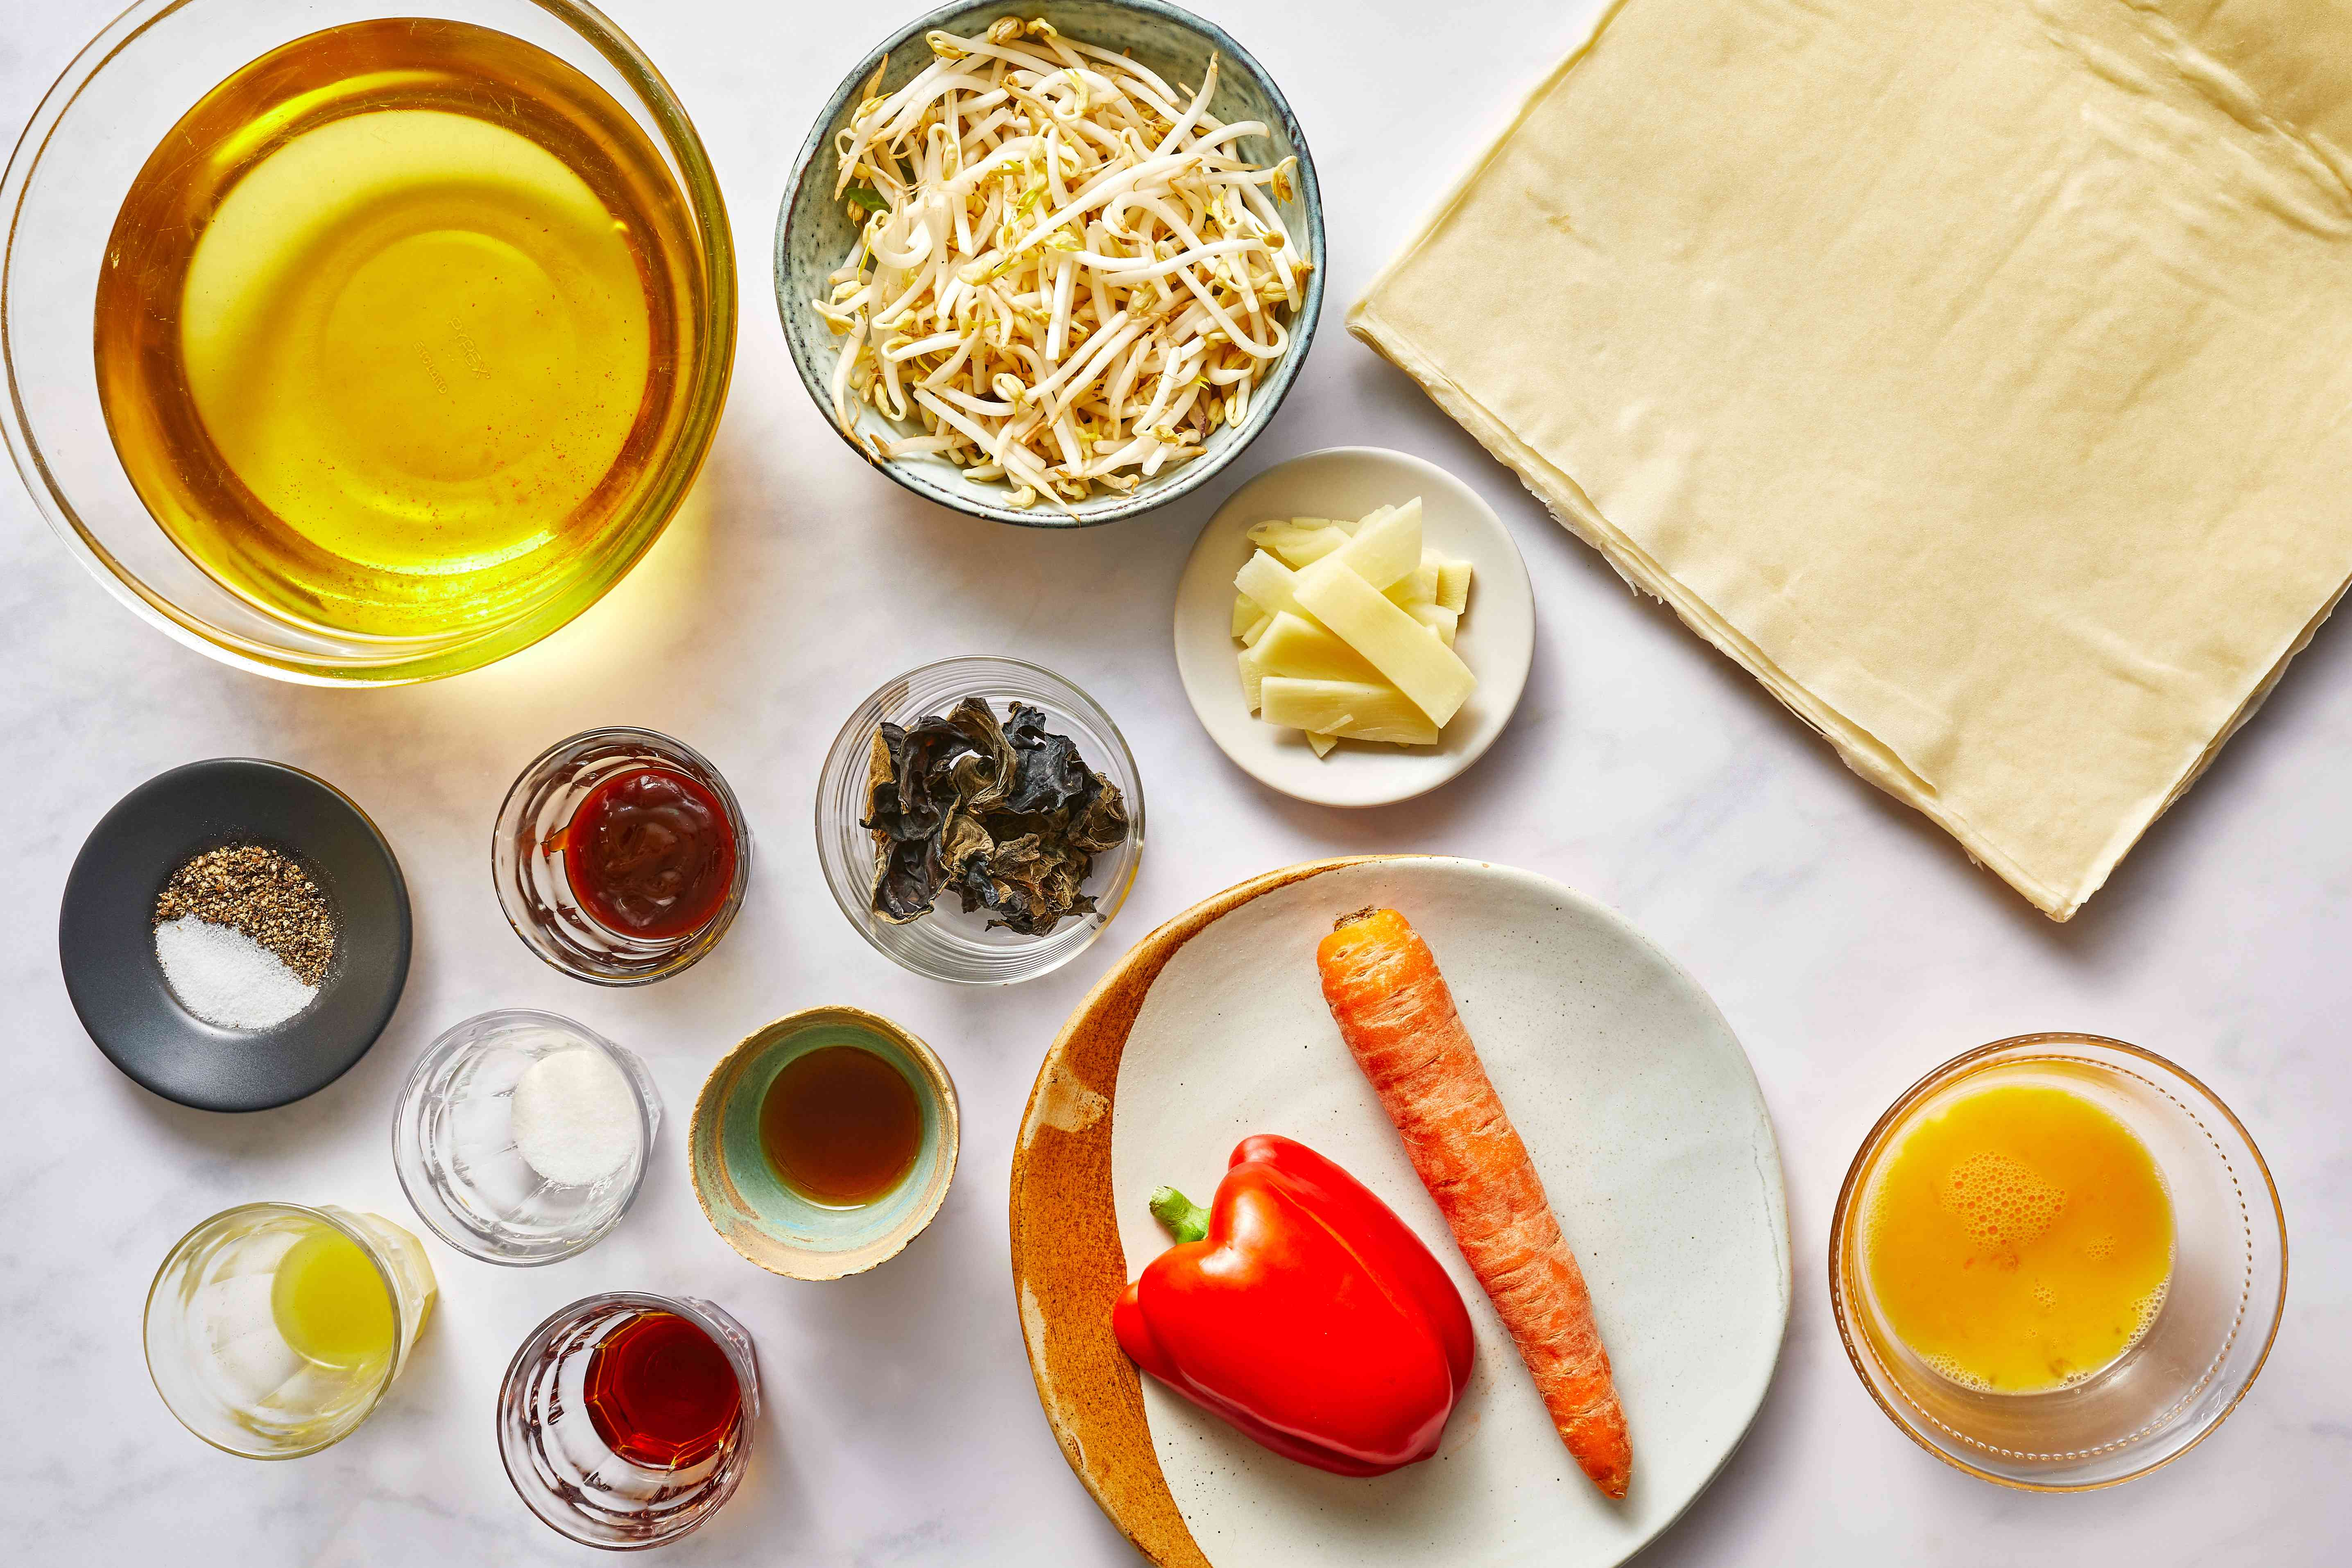 Chinese Vegetable Spring Rolls filling ingredients